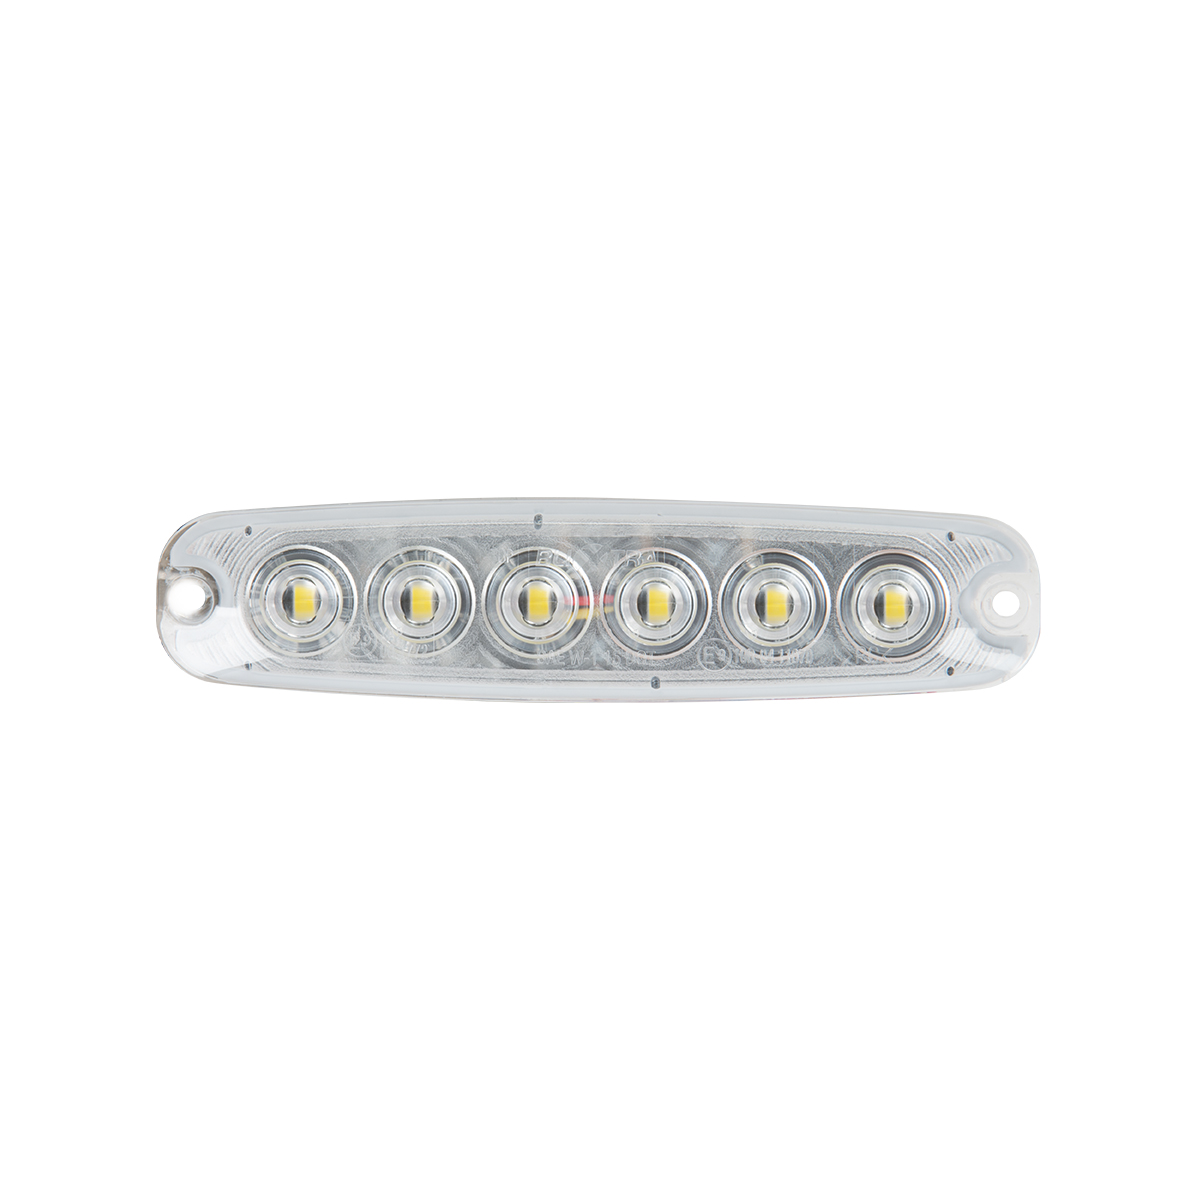 "5 ⅛"" Ultra Thin Strobe LED Light - Amber/Clear"